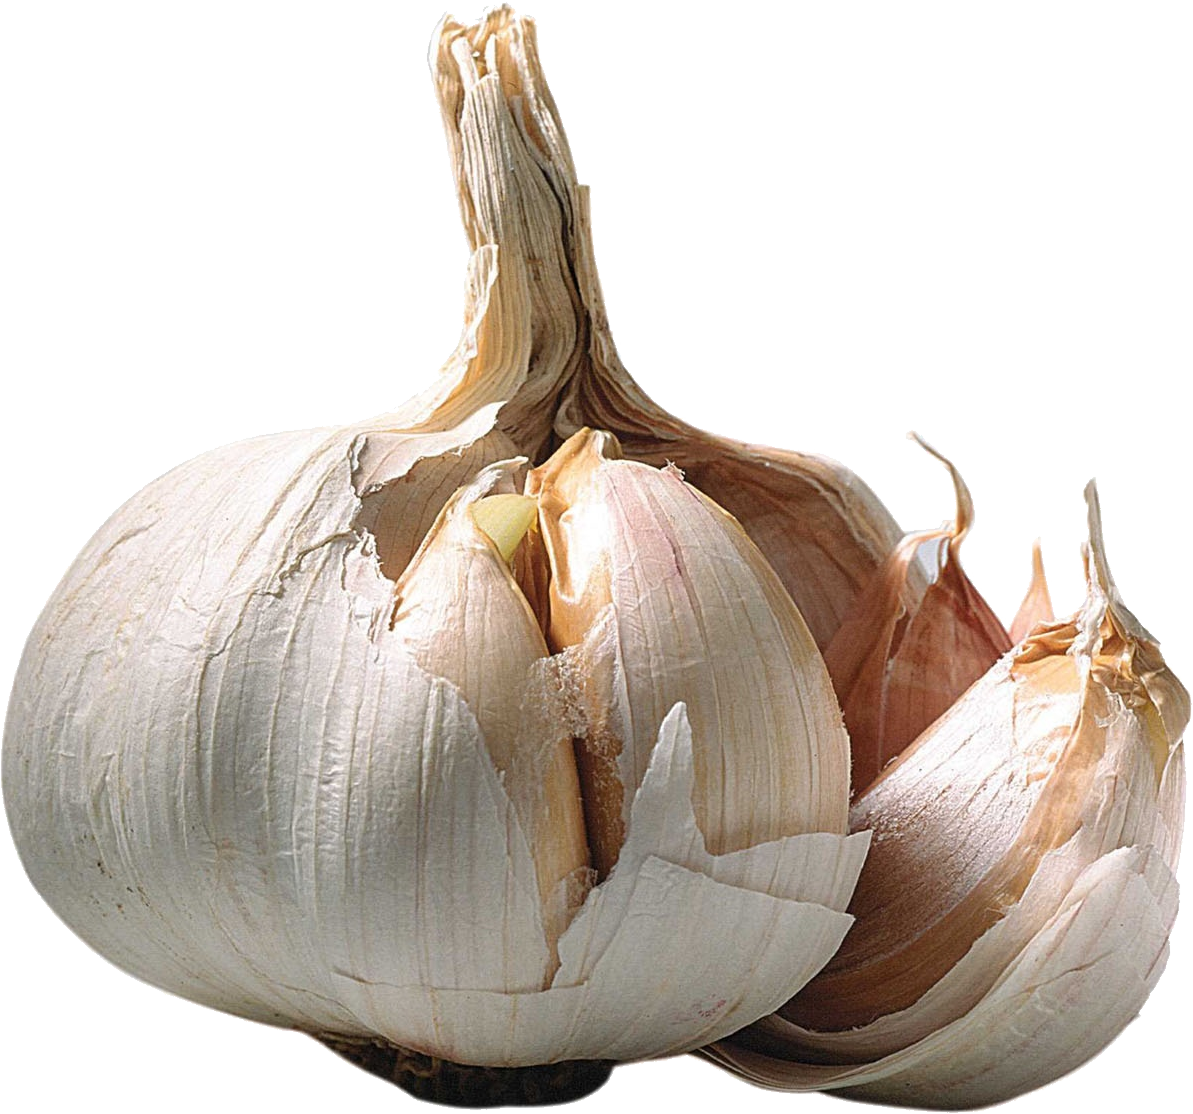 Png images free download. Garlic clipart shallot